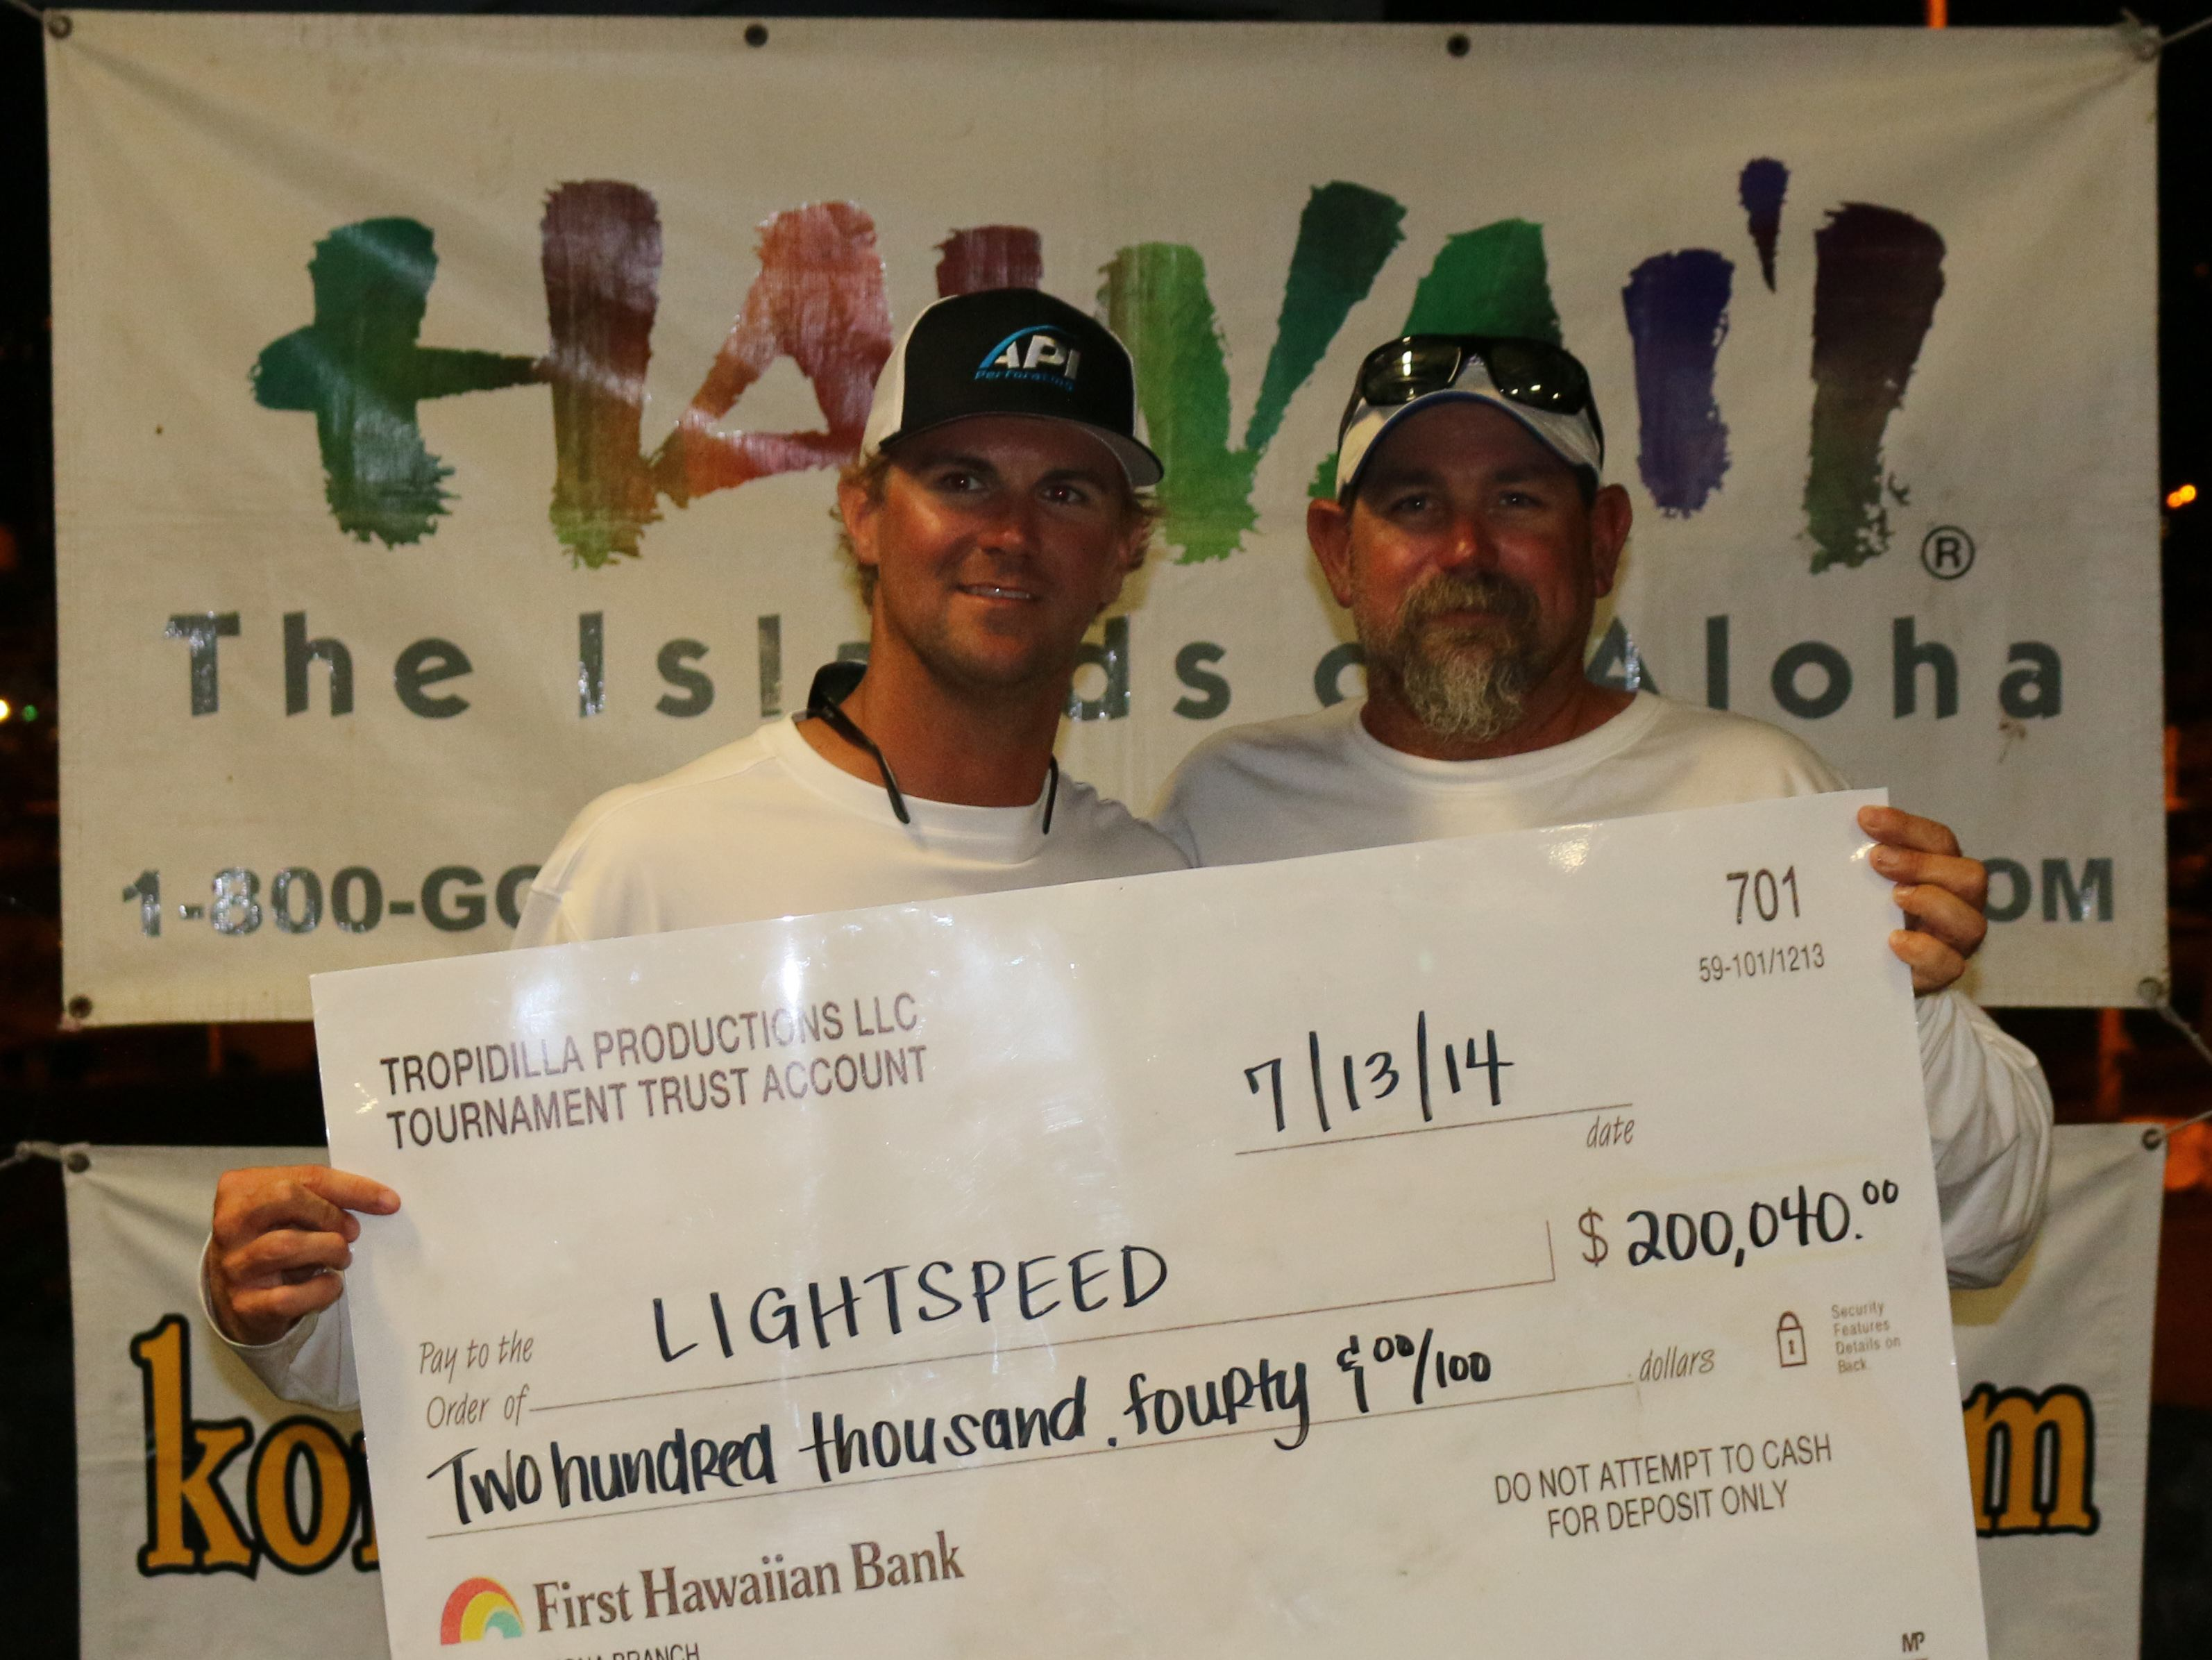 Hawaii Marlin Tournament Series enters 29th year.